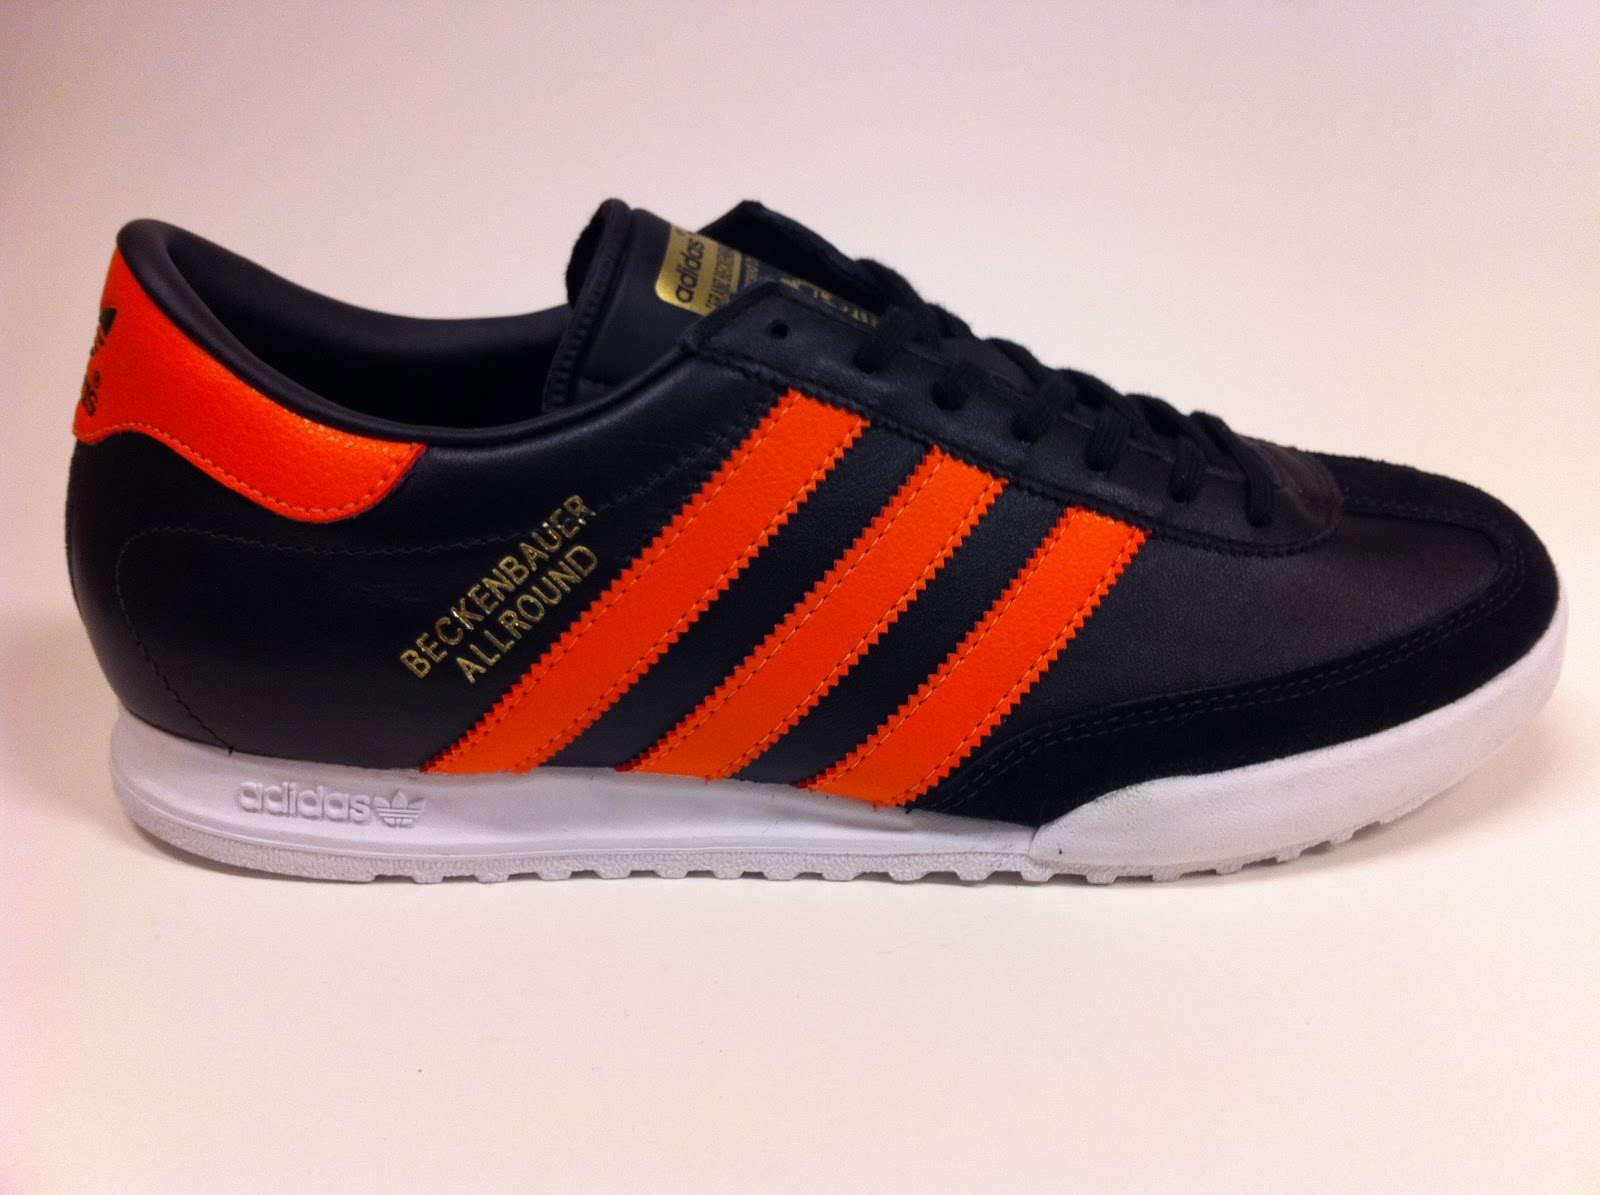 Adidas Addicted Shoes